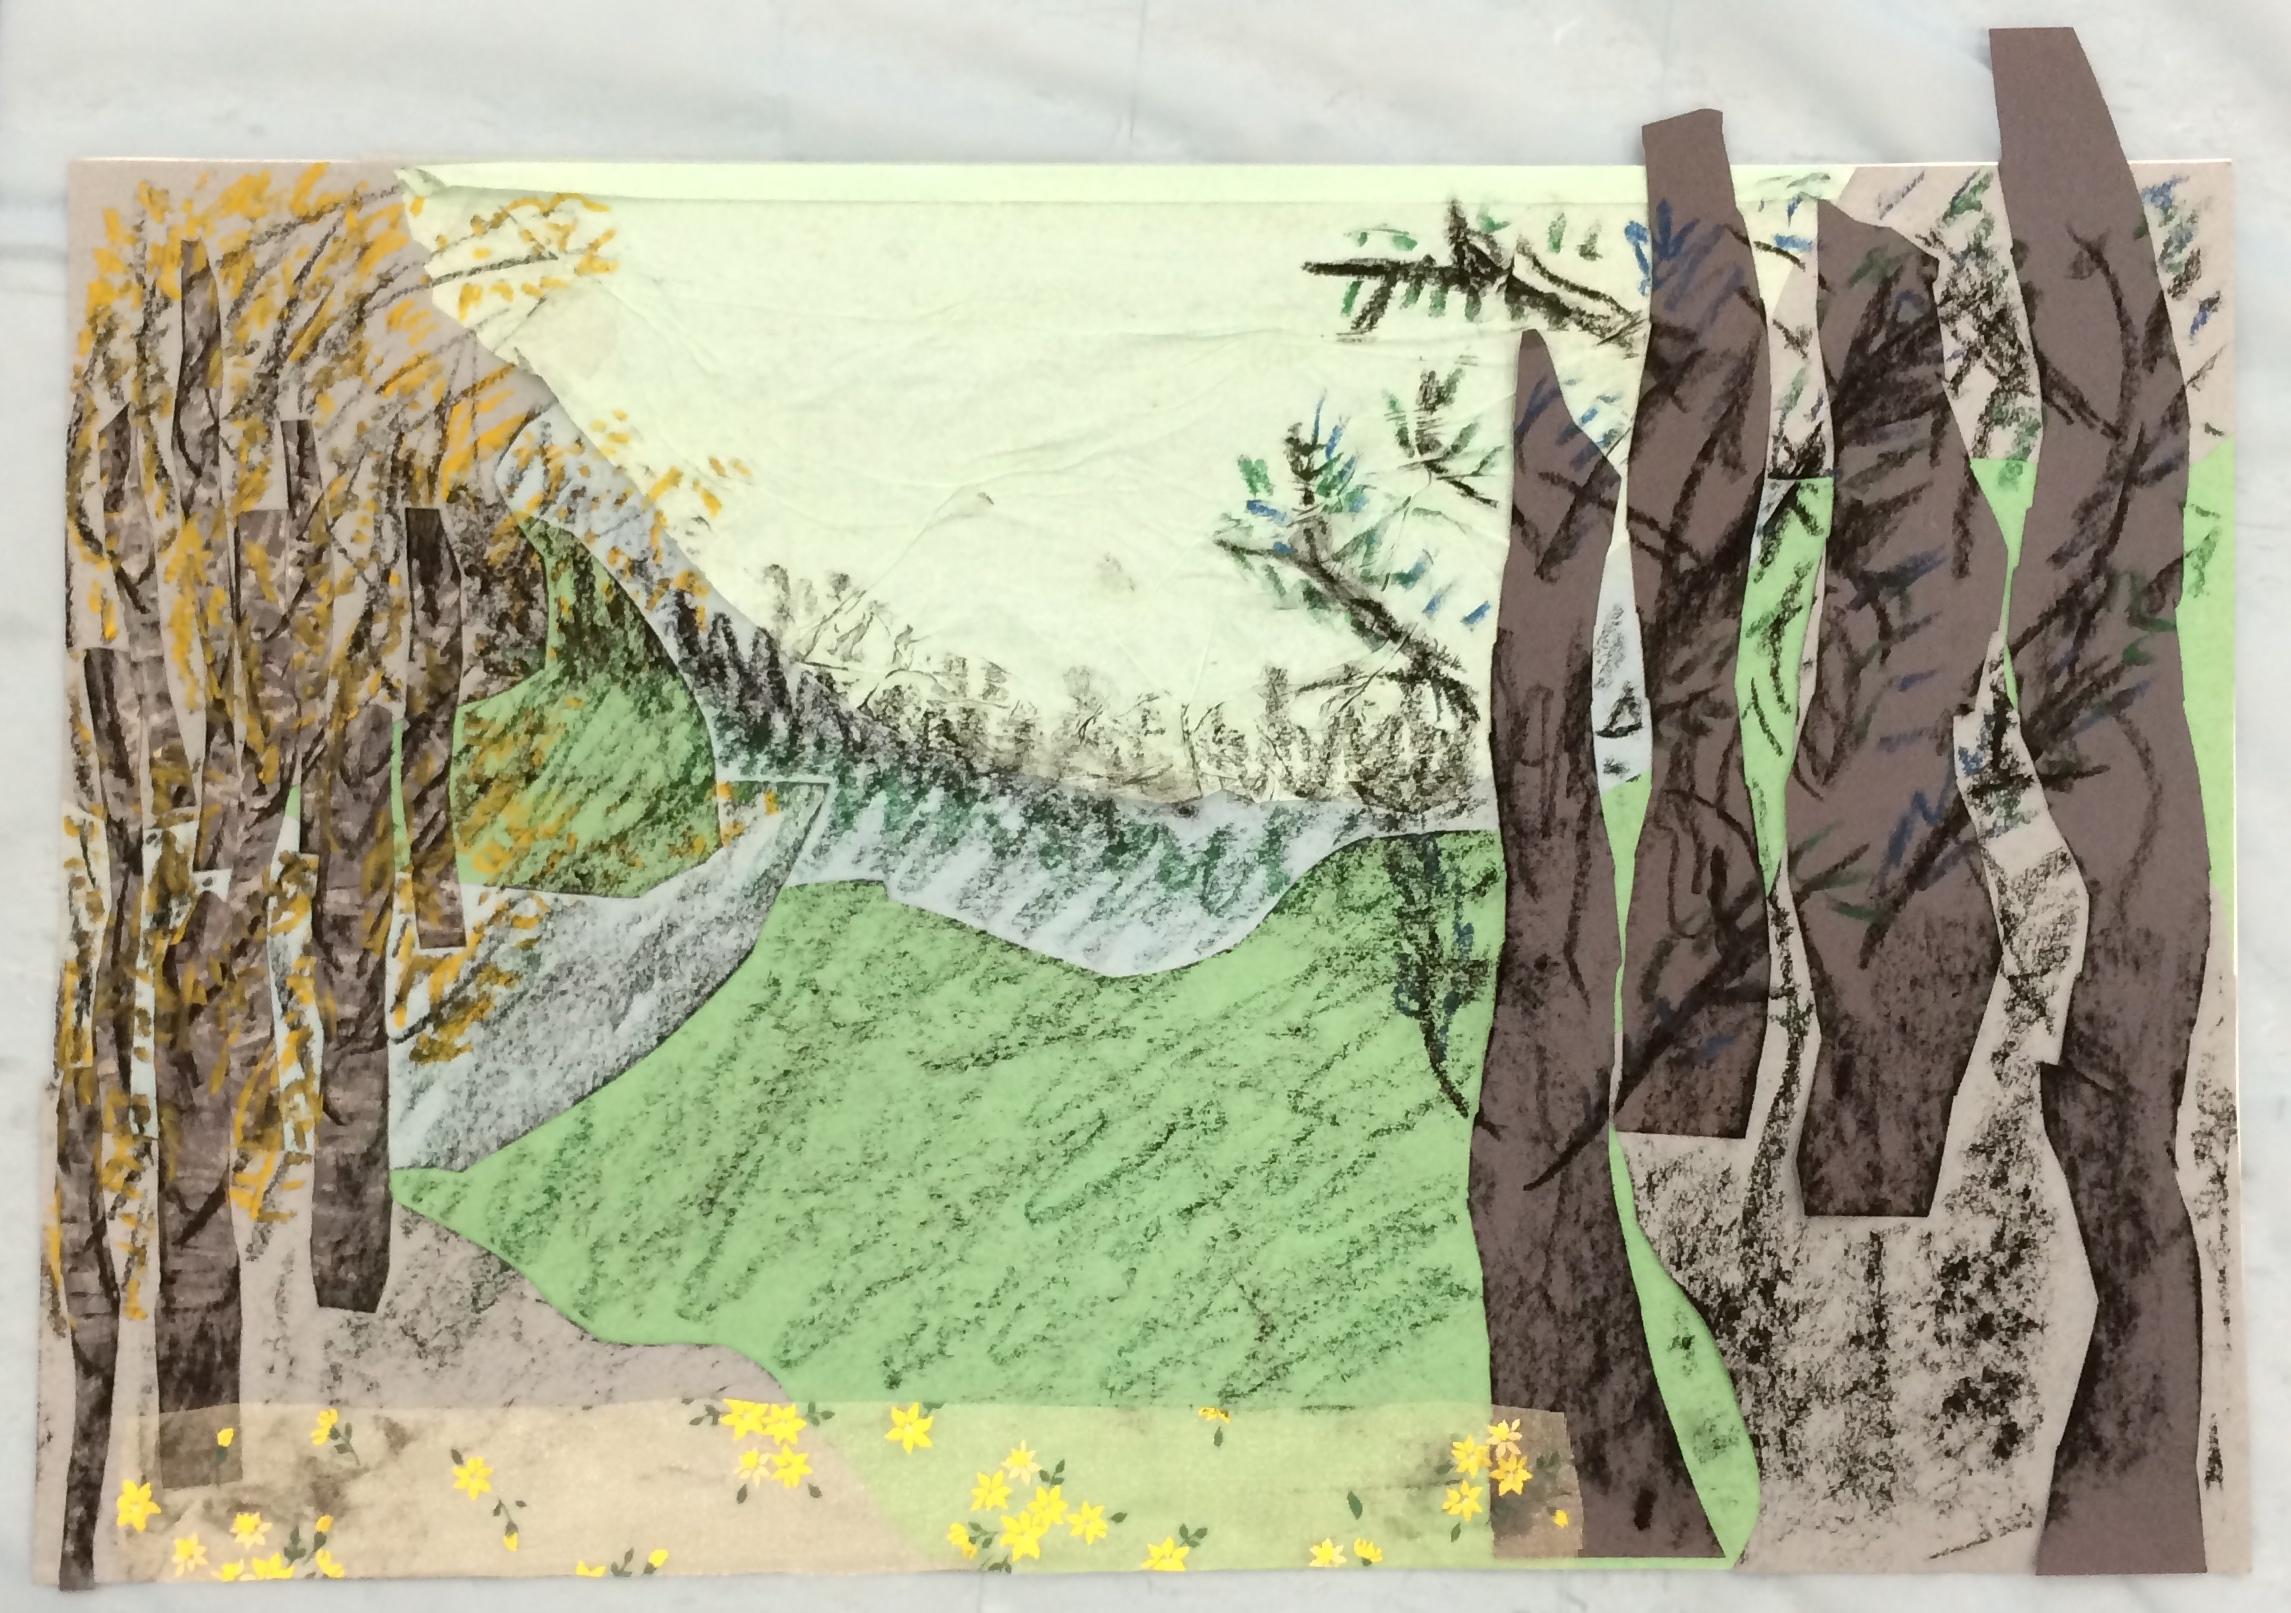 Visual Art Therapy | ArtReach Workshop | April 2014